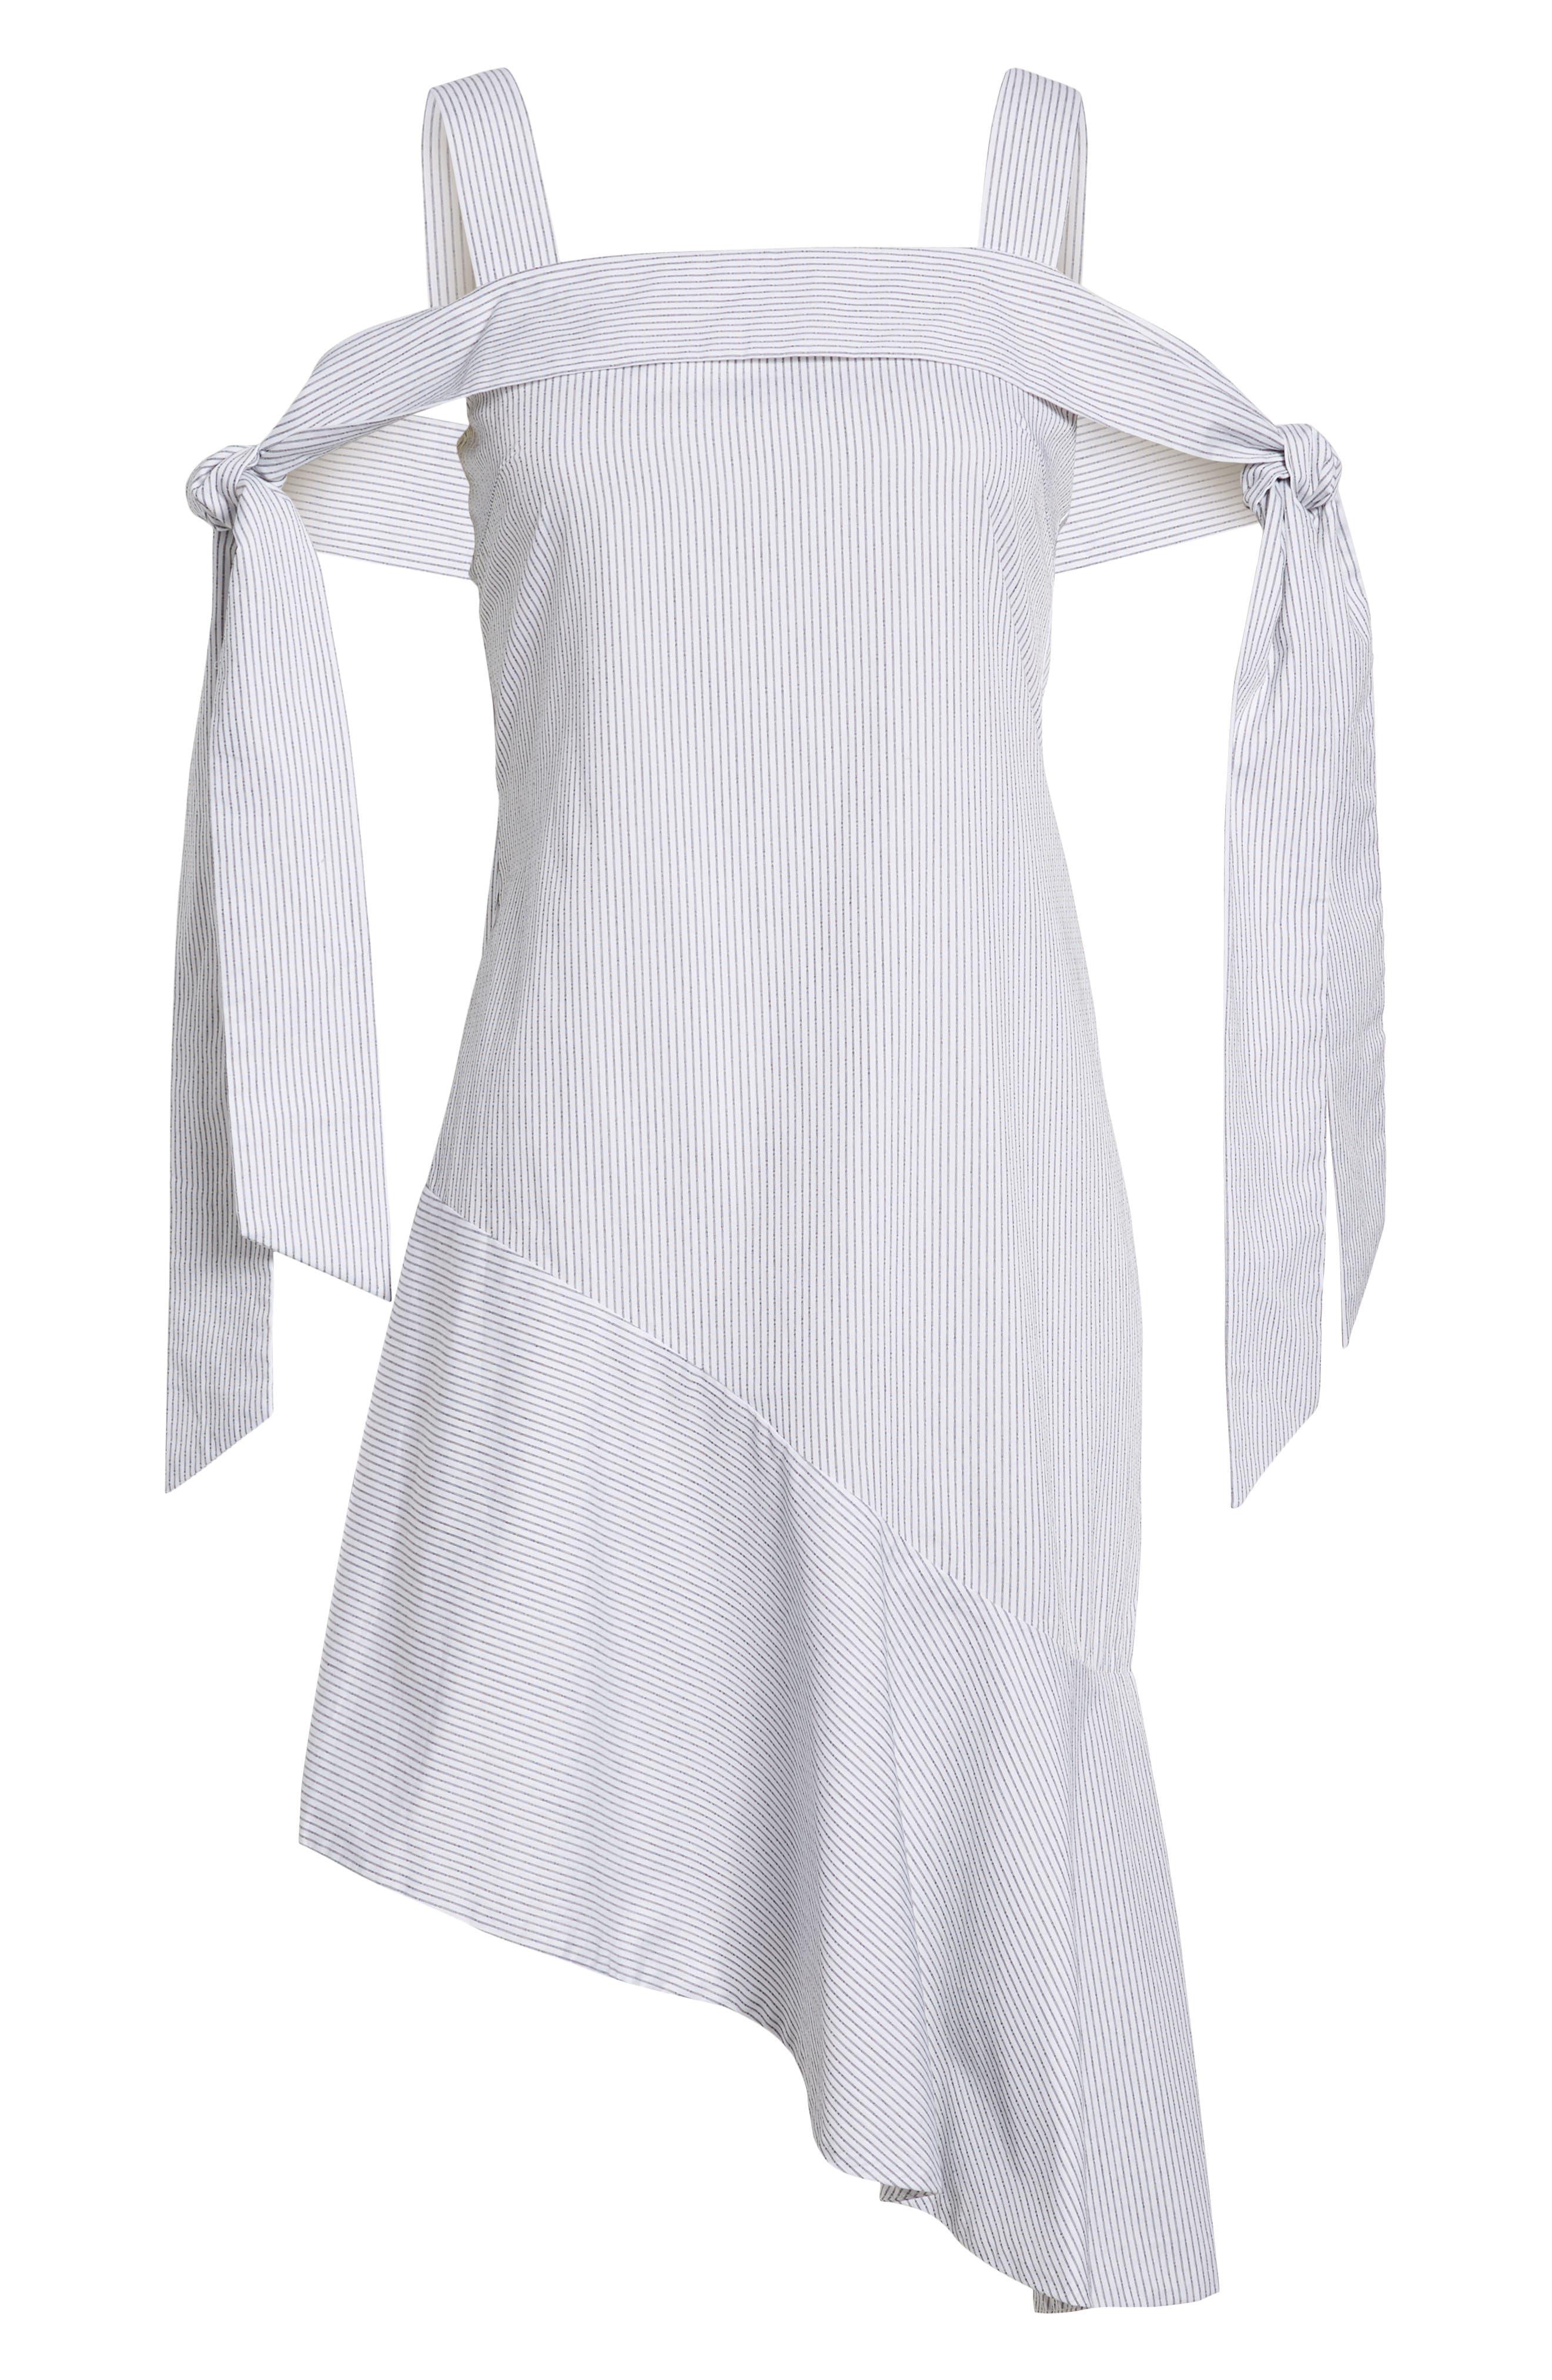 Tone Cold Shoulder Dress,                             Alternate thumbnail 7, color,                             Stripe